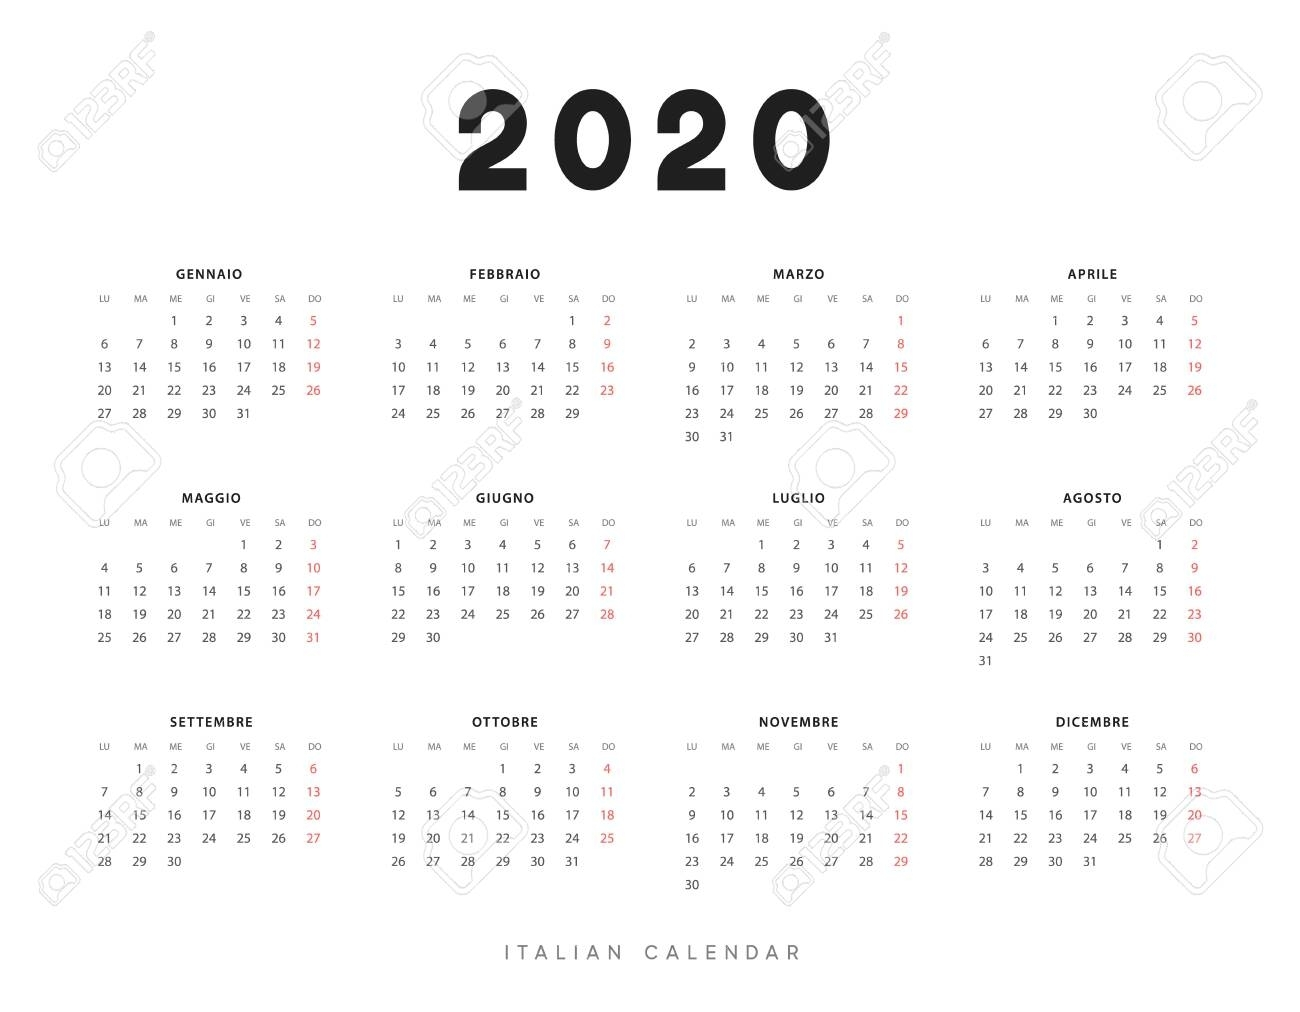 Monday Start Calendar 2020 - Colona.rsd7 with 2020 Calendar That Begins On Monday